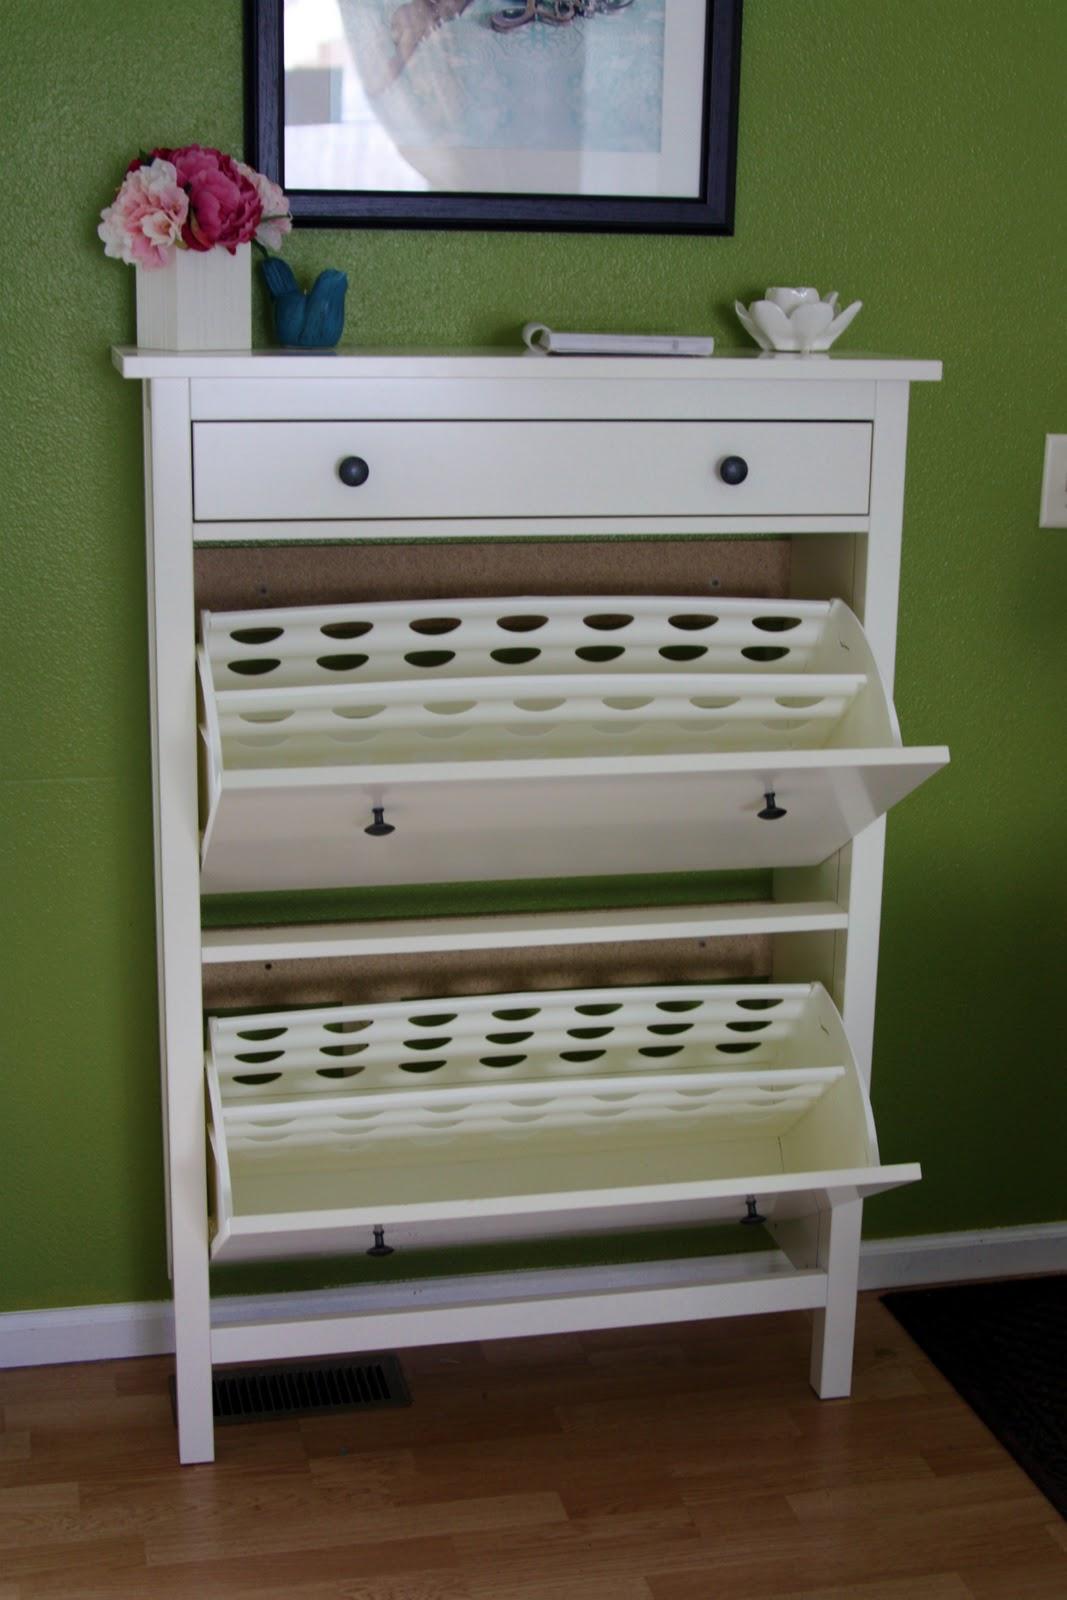 iheart organizing april challenge project purge shoes. Black Bedroom Furniture Sets. Home Design Ideas